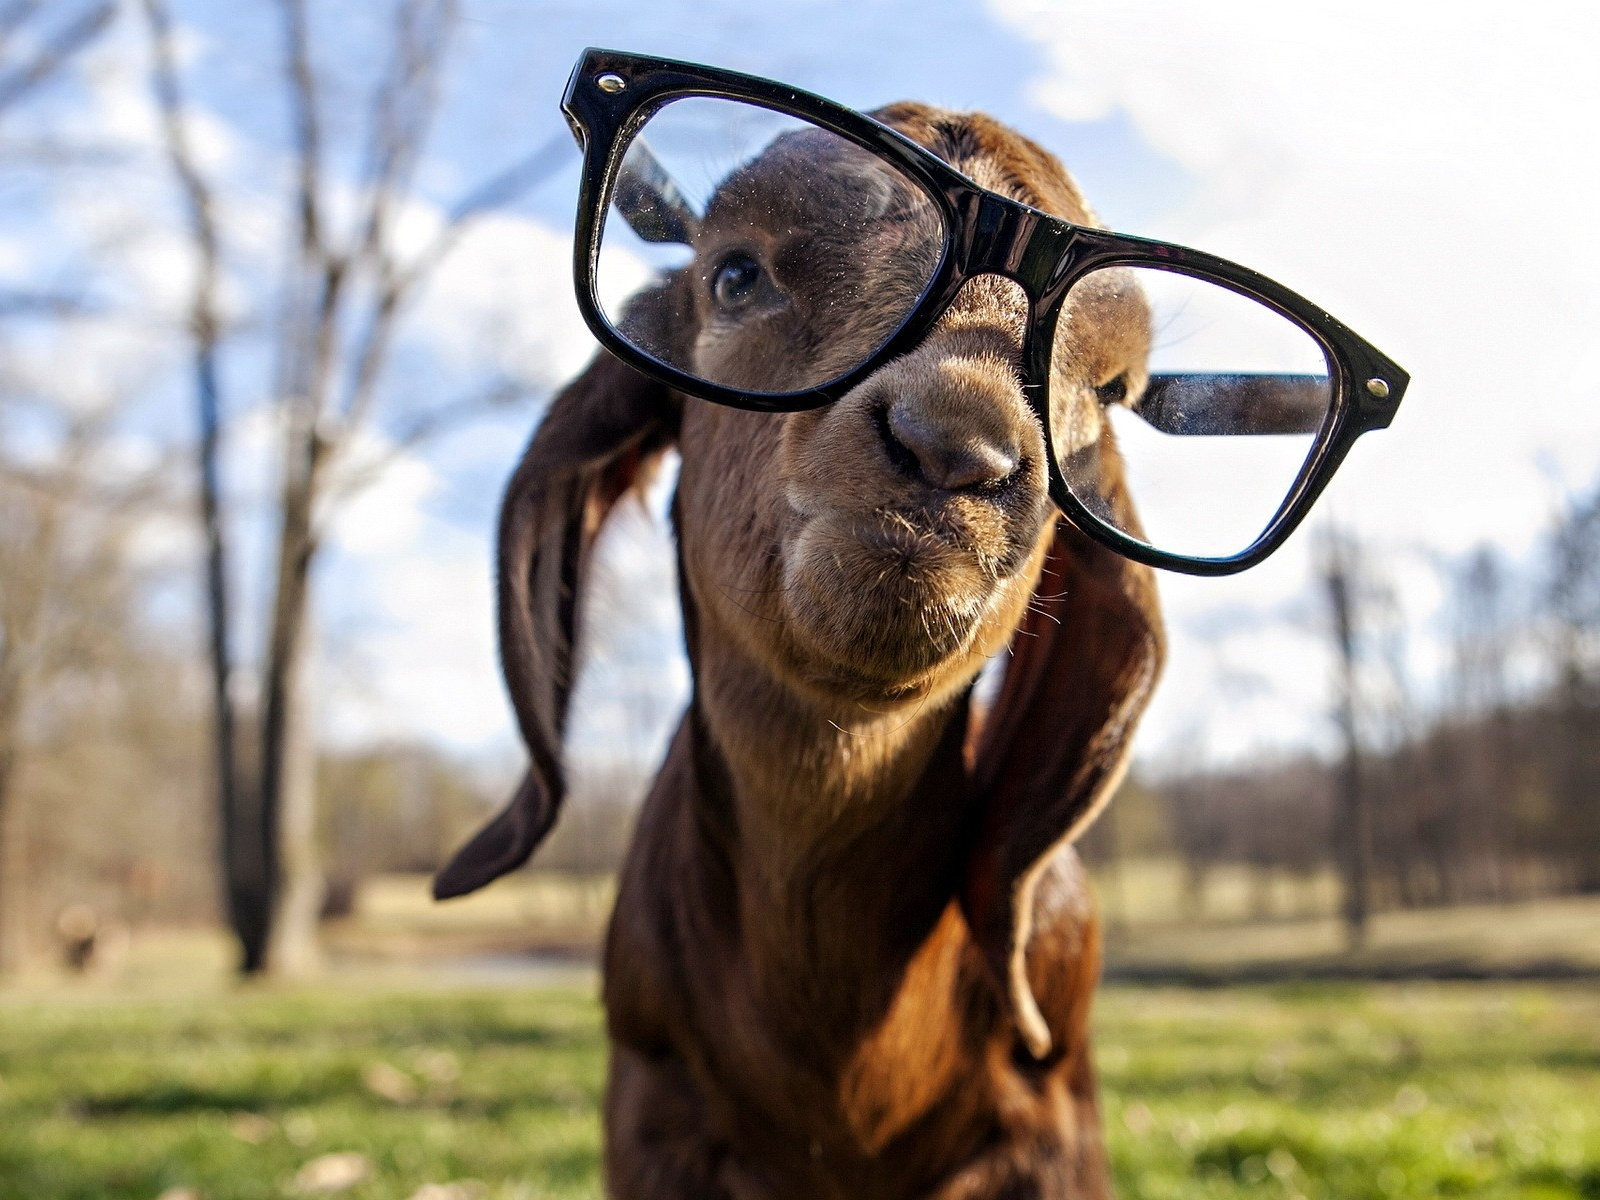 Adorable Goat Wallpaper; Goat ...